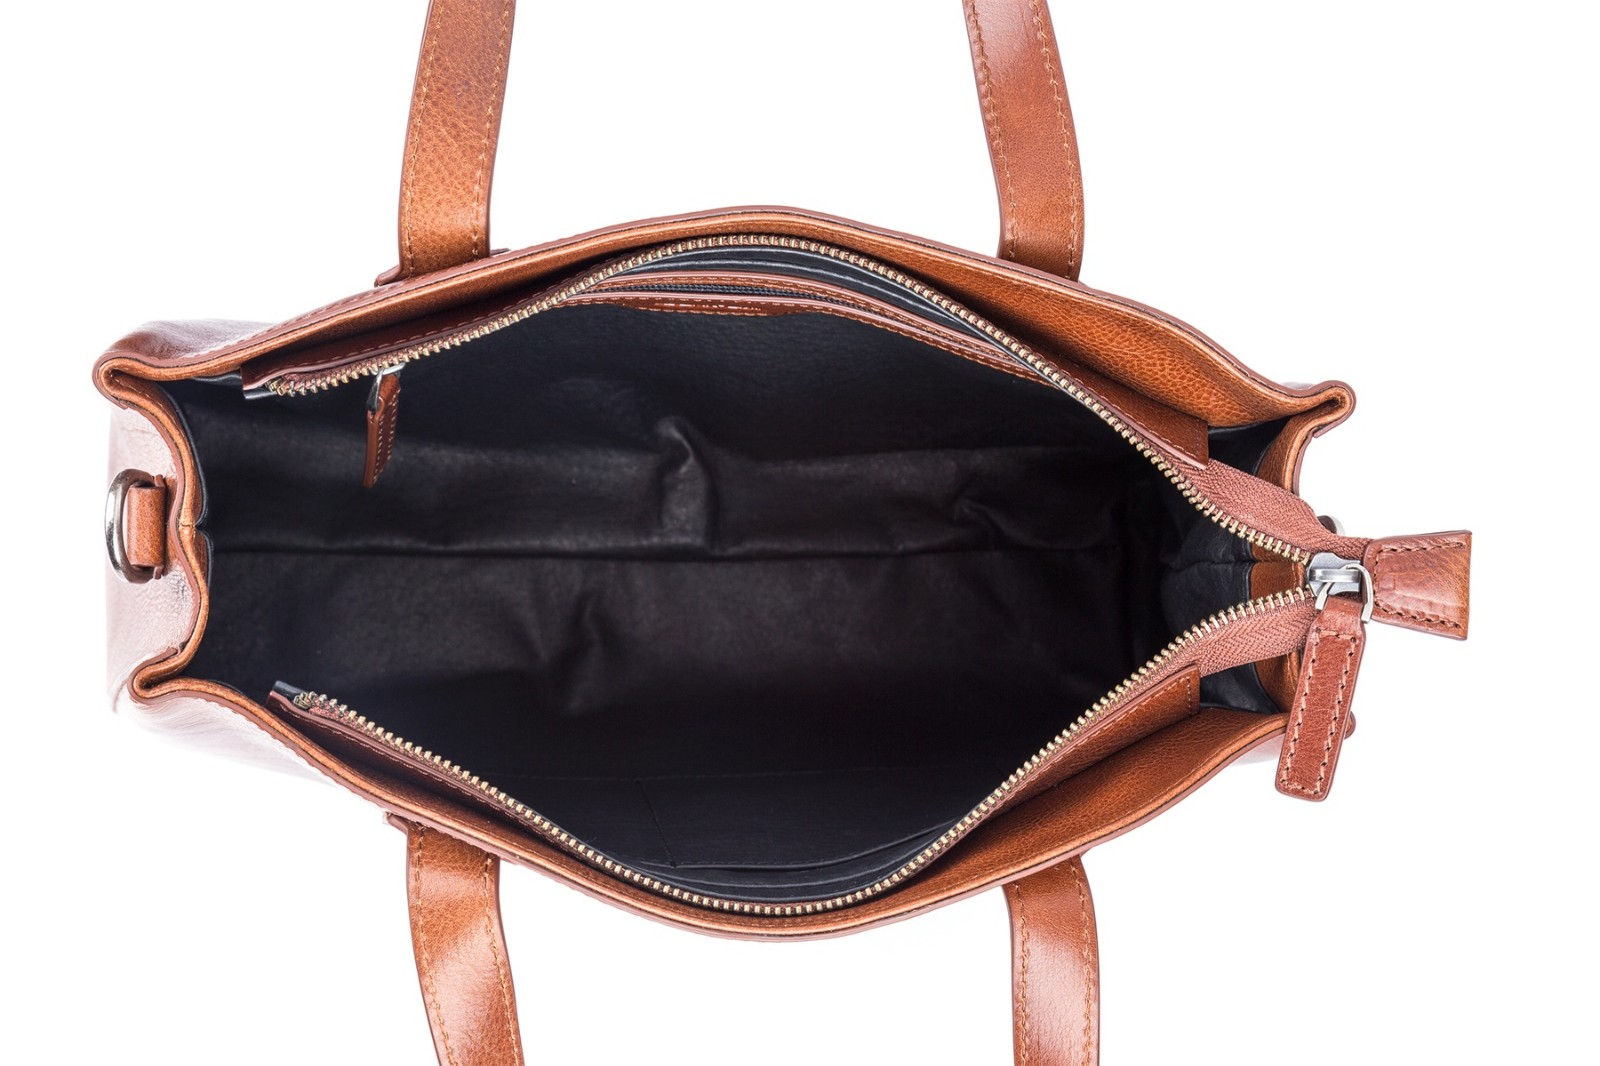 GF bags-Latest Handbags | Handbag Top Handle Waxed Leather Zipper Close Bag - Gaofeng-3